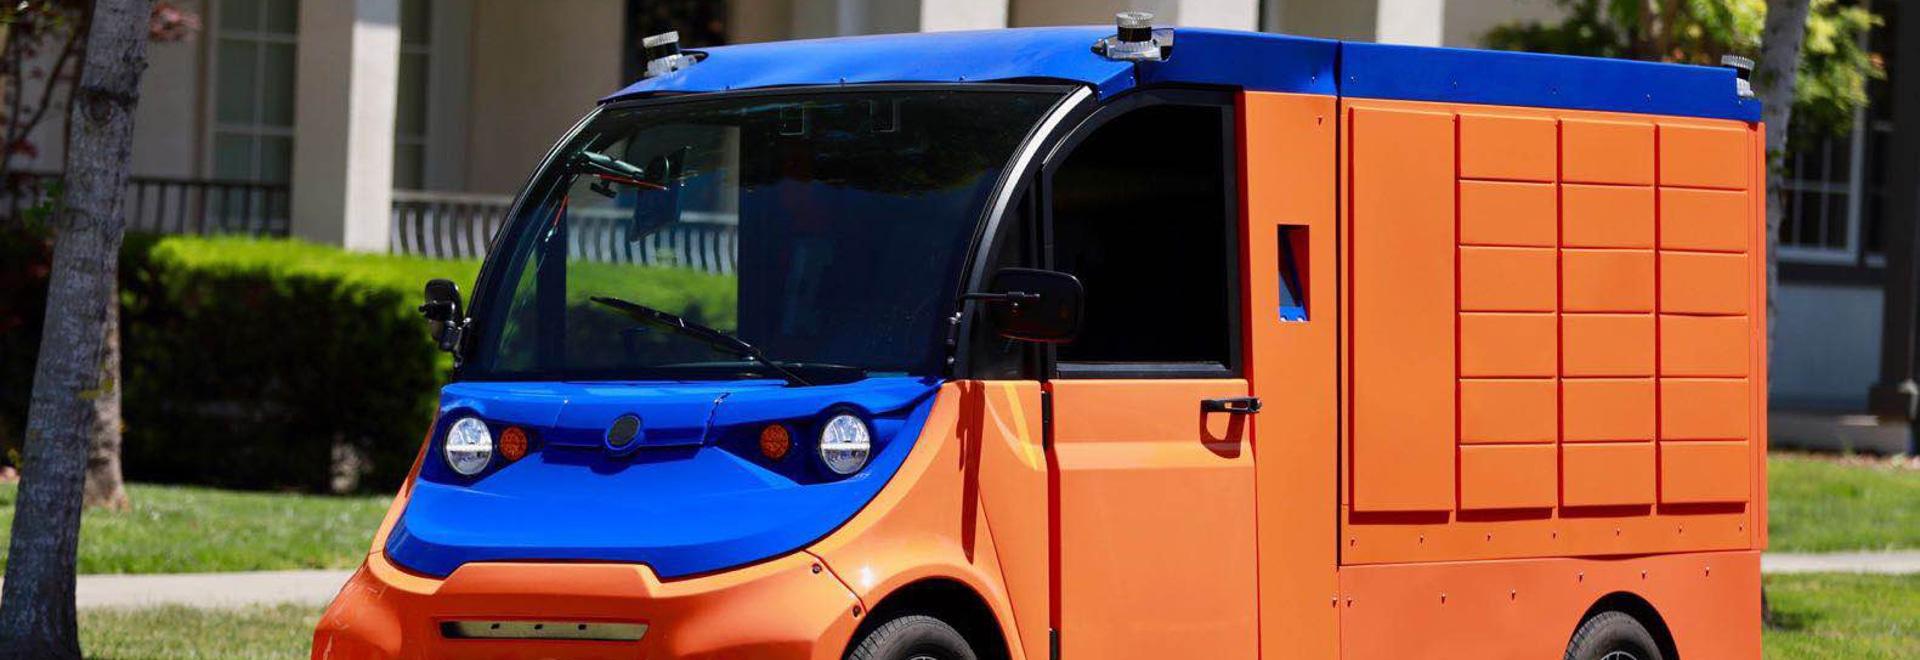 Boxbot führt Last-Mile, selbstfahrendes Paketzustellsystem ein